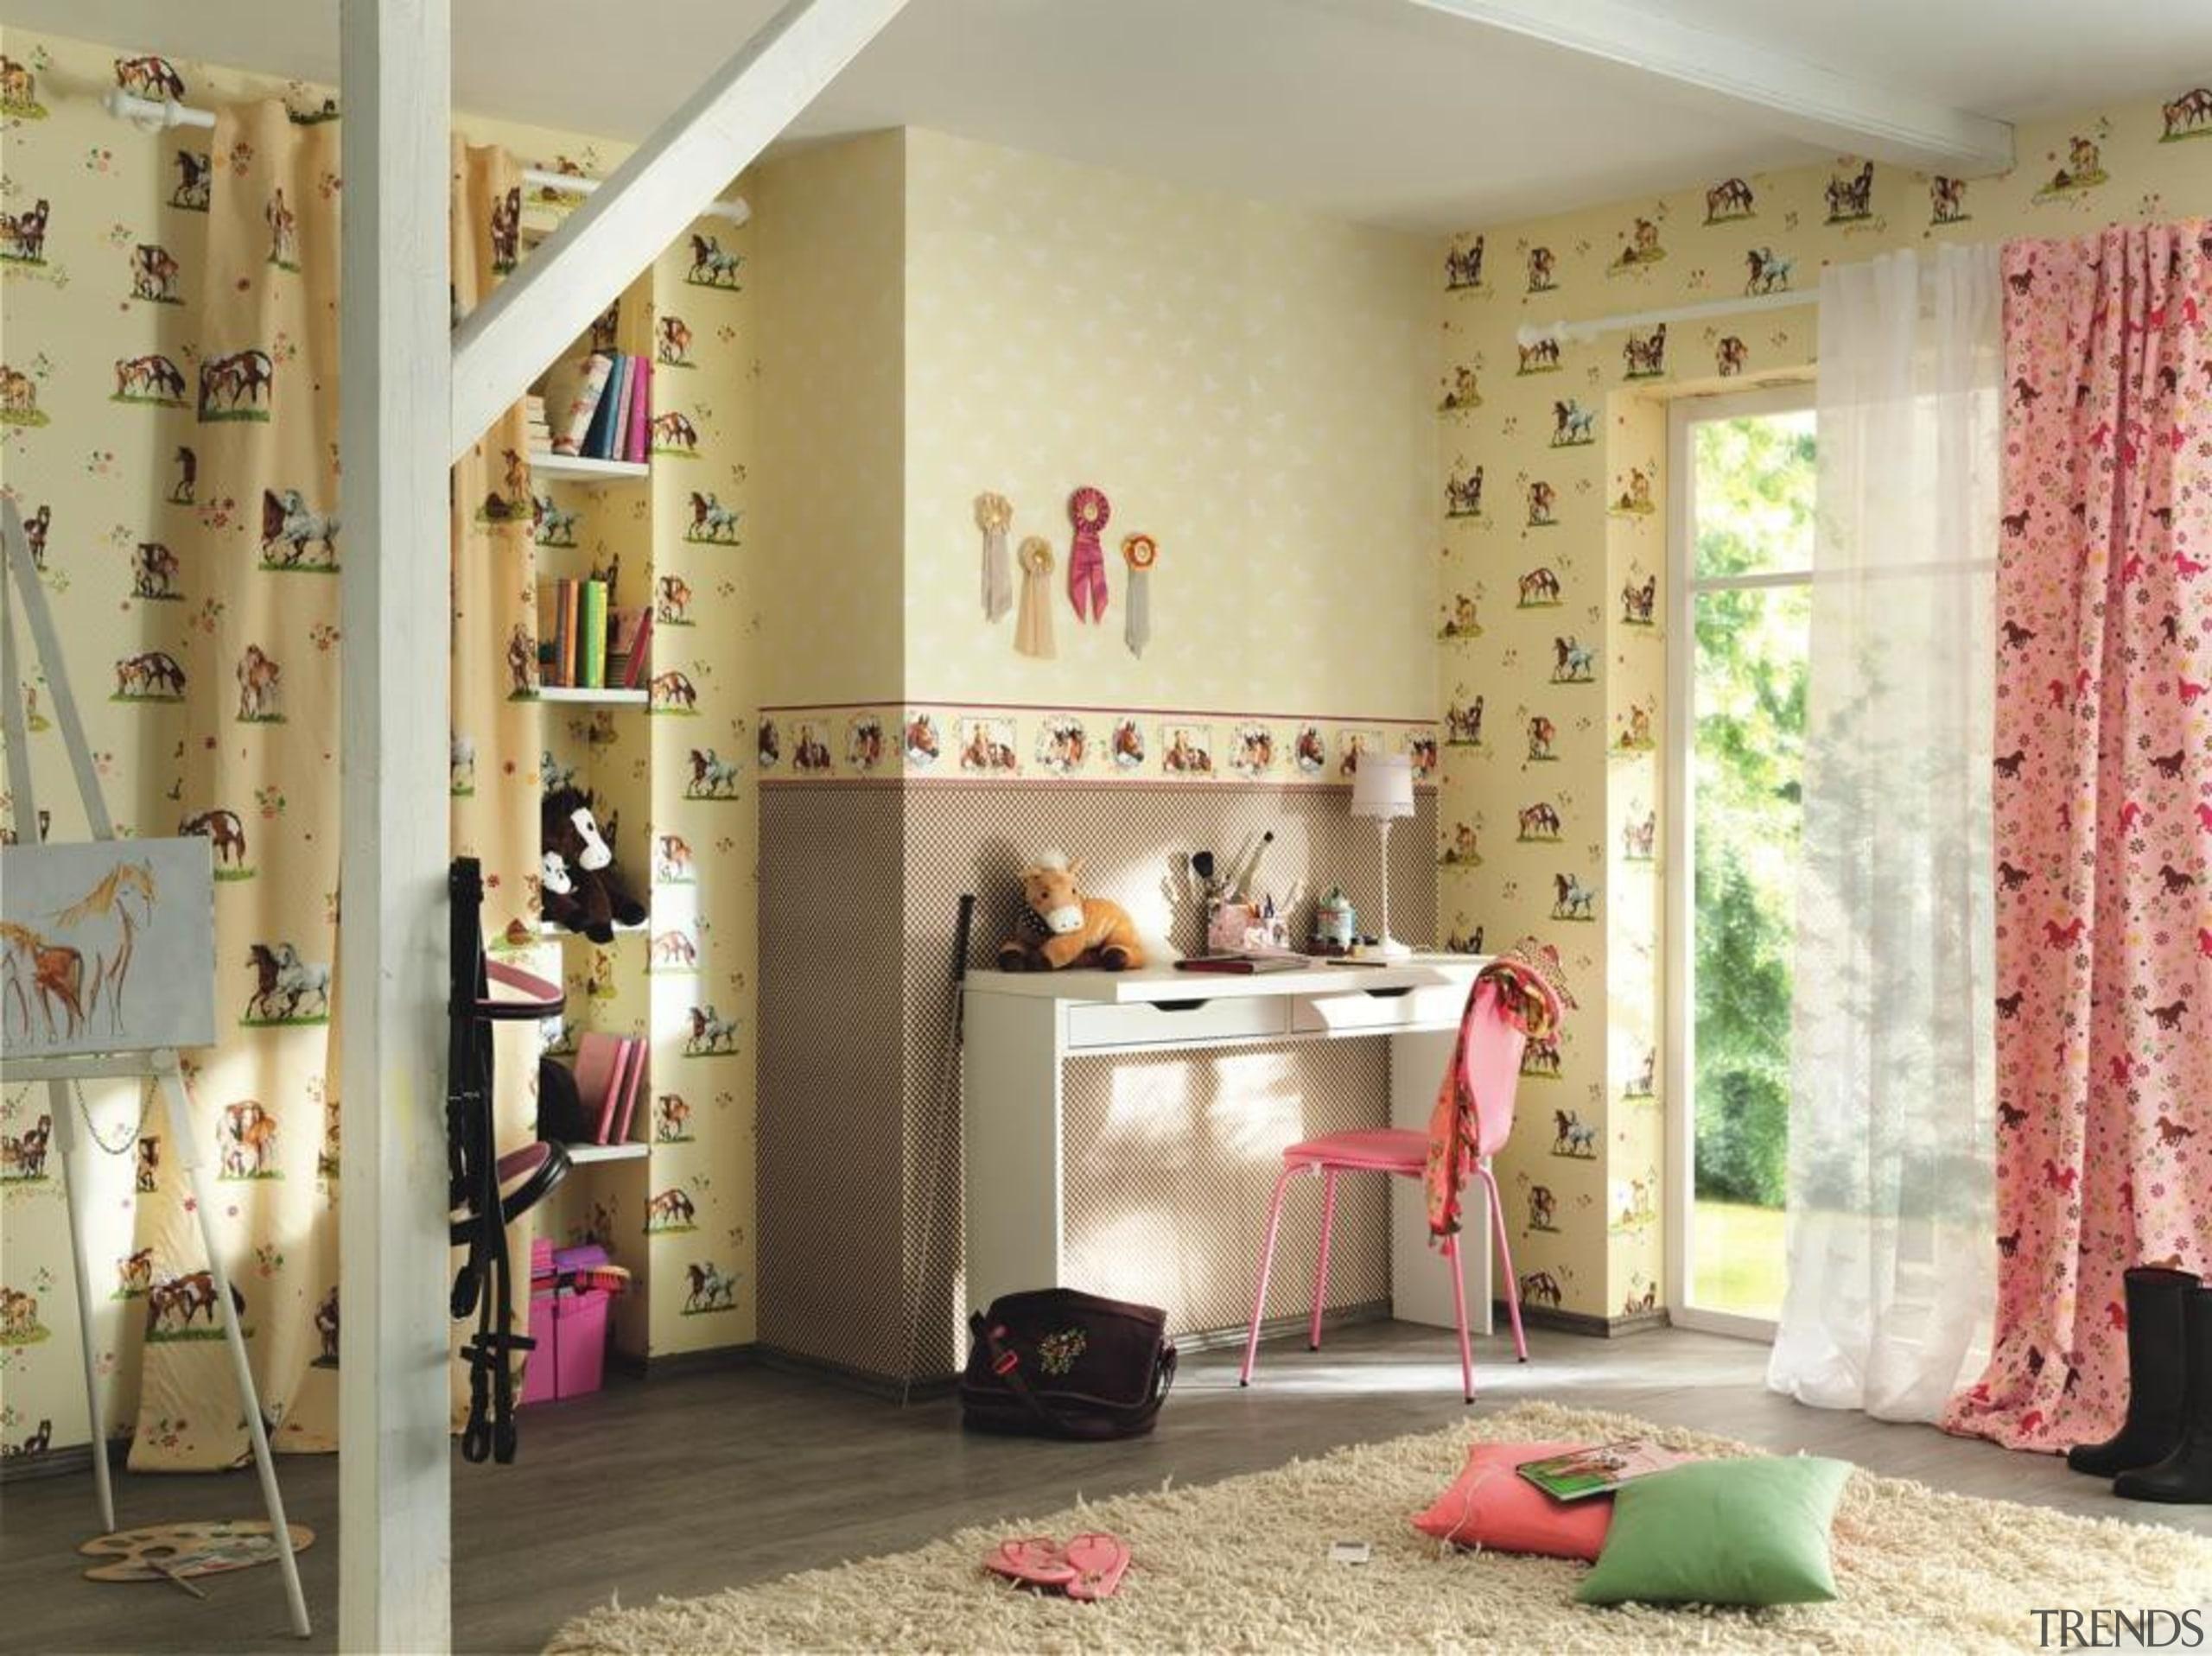 Villa Coppenrath Range - Villa Coppenrath Range - bed, curtain, furniture, home, interior design, product, room, textile, window treatment, orange, brown